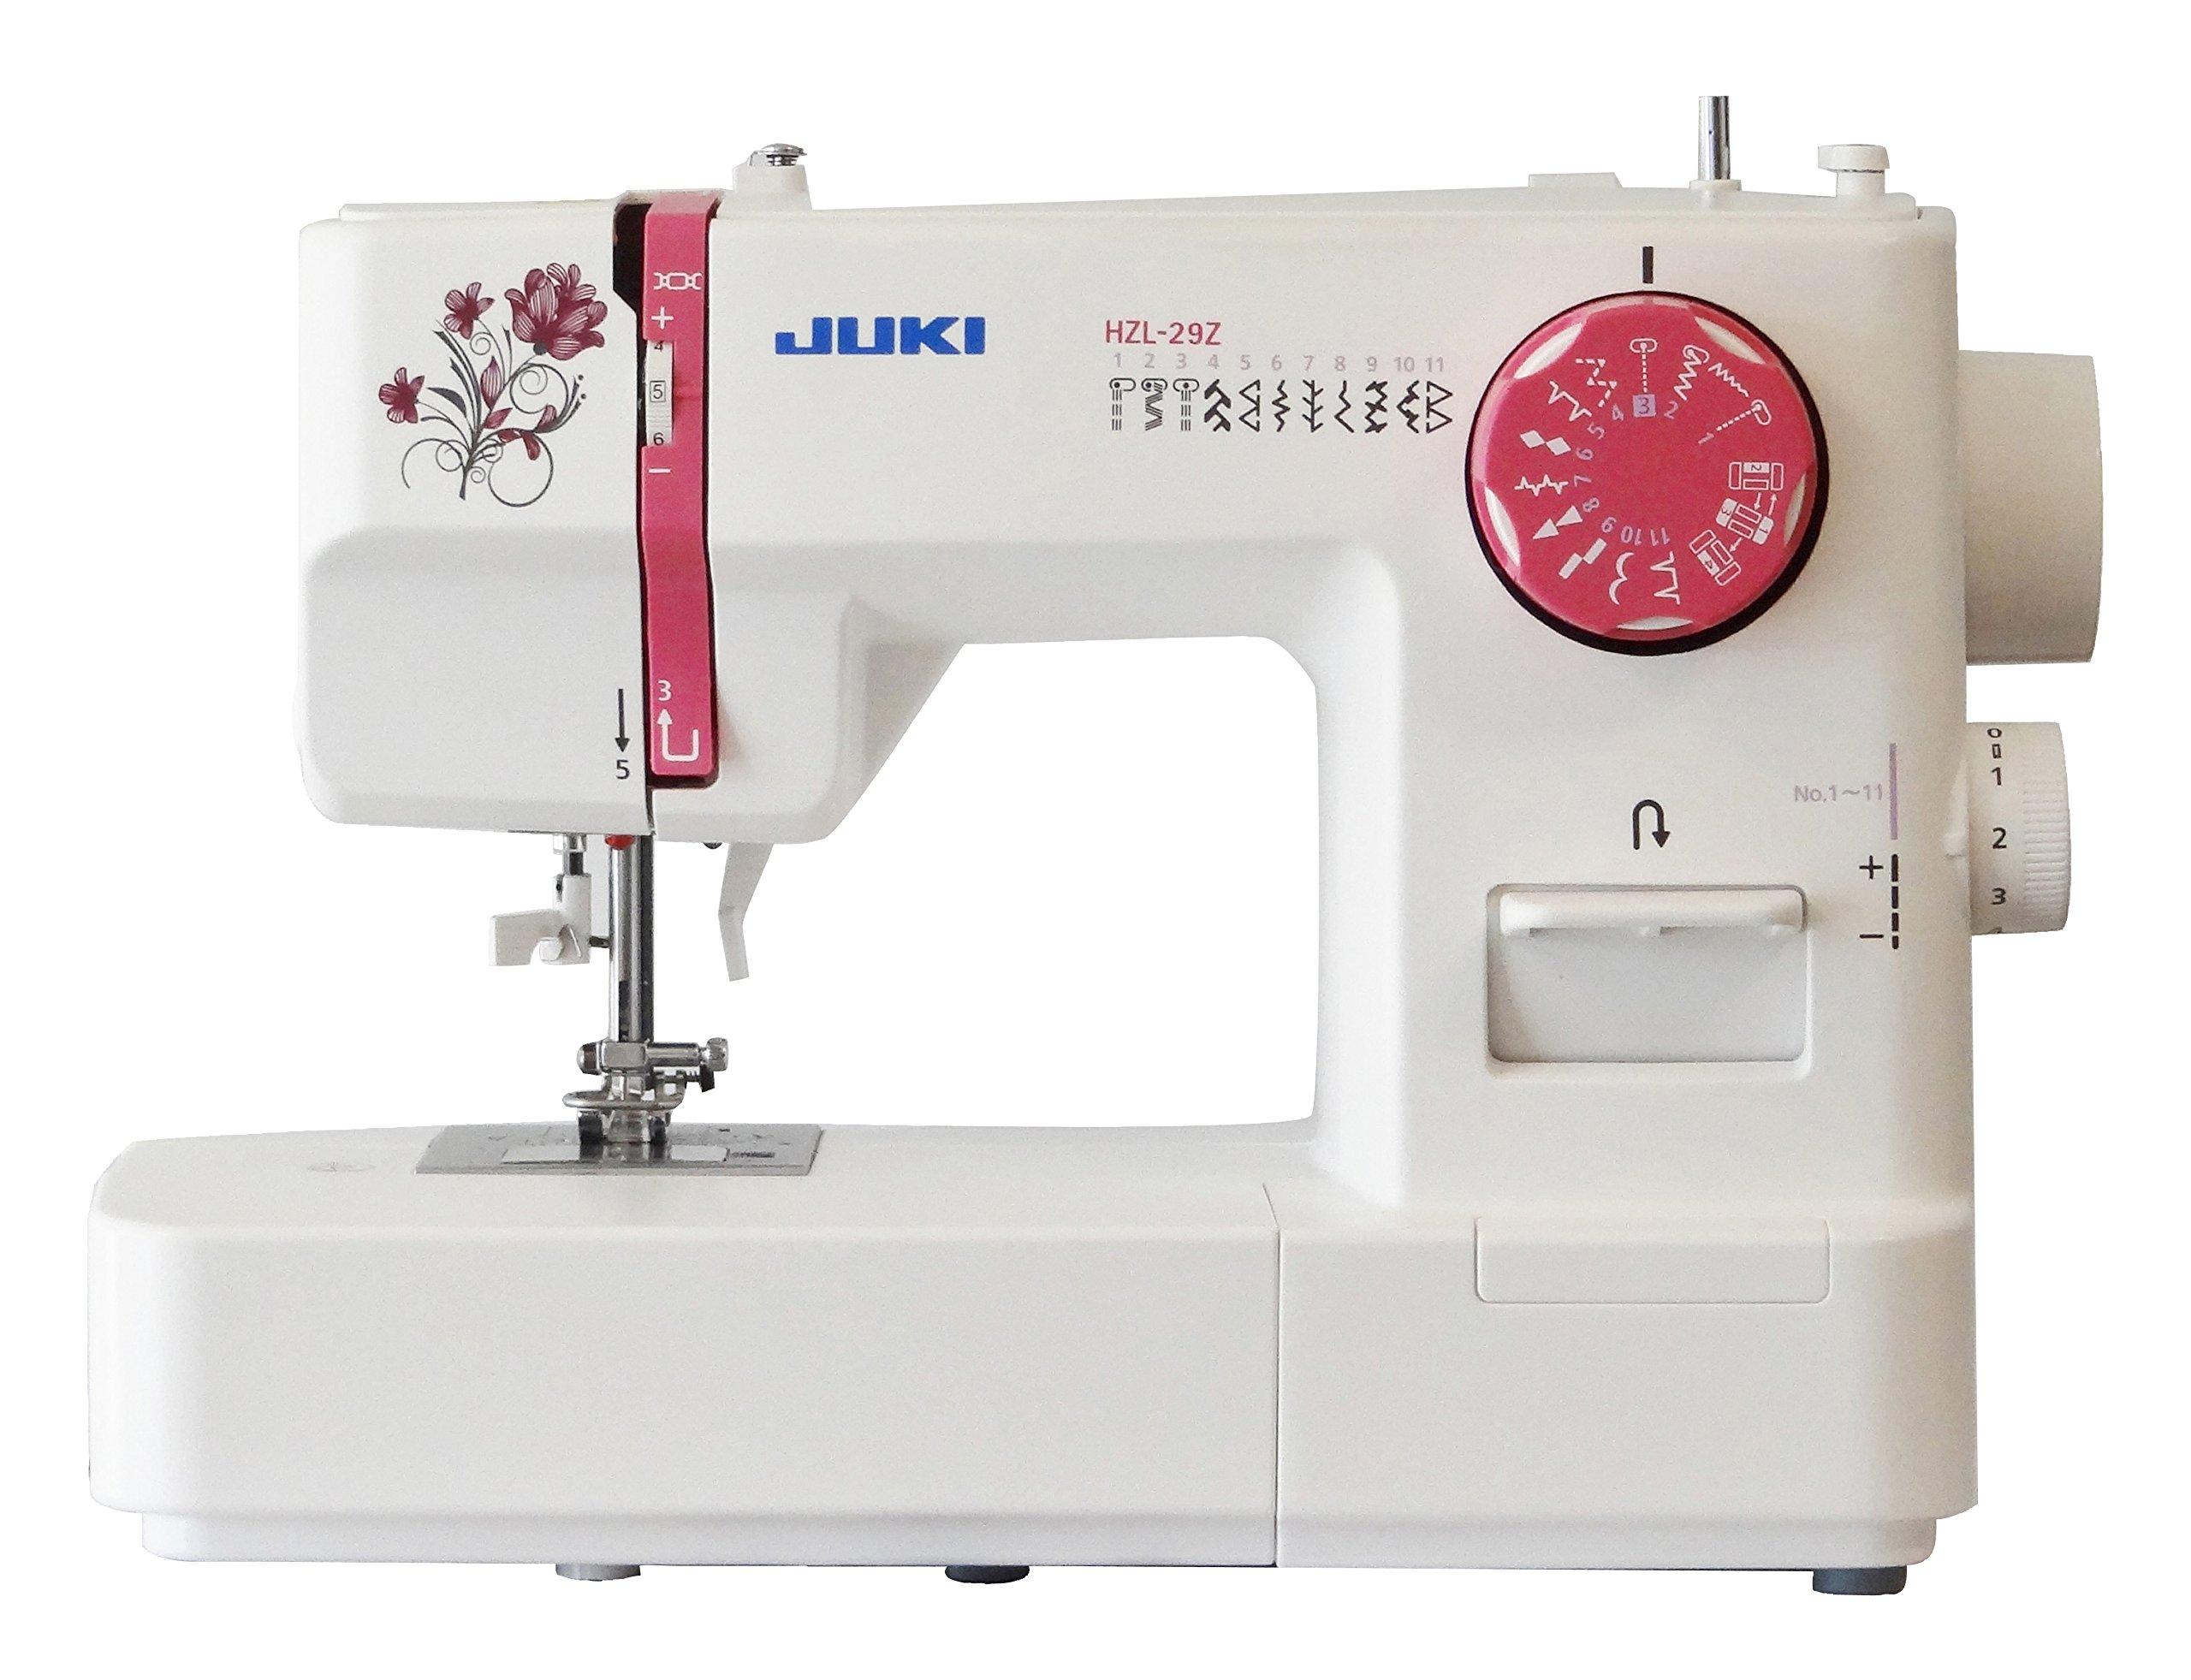 JUKI hzl-29z máquina de Coser mecánico Metal Blanco 36 x 15, 5 x ...